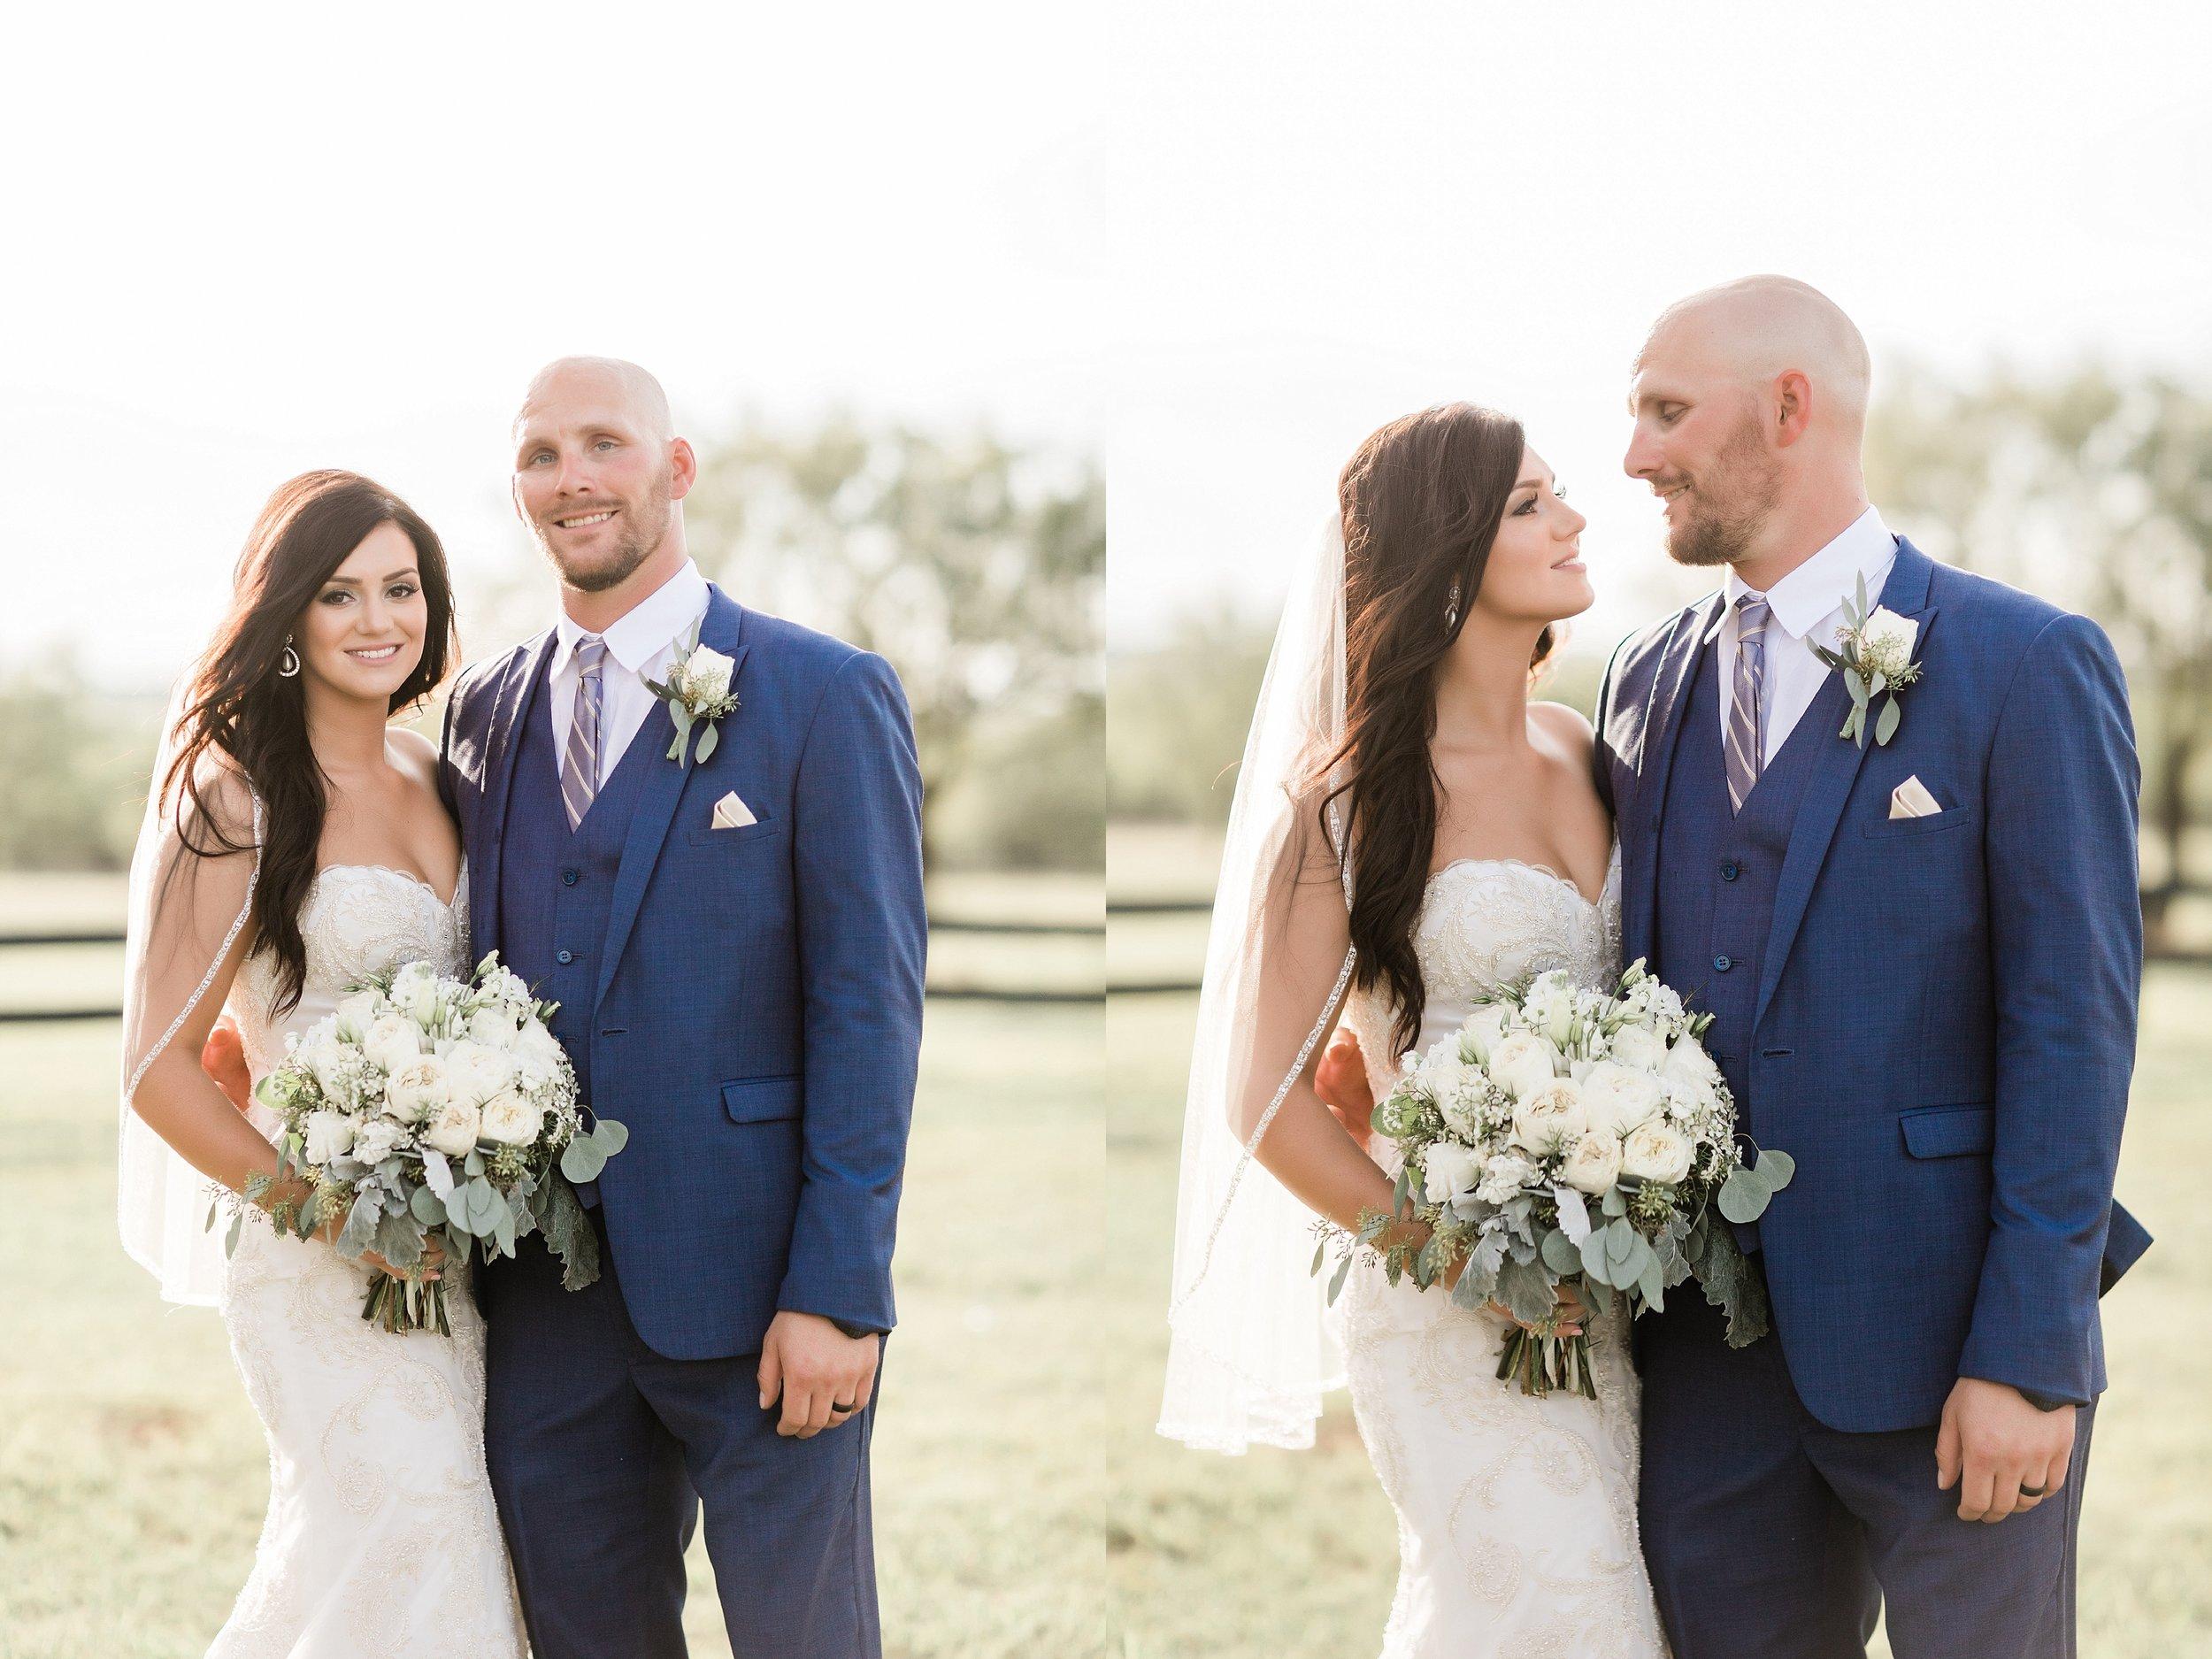 bailey-and-carl-coyote-ranch-resort-wedding-photographer-wichita-falls-texas-destination-wedding-0042.jpg